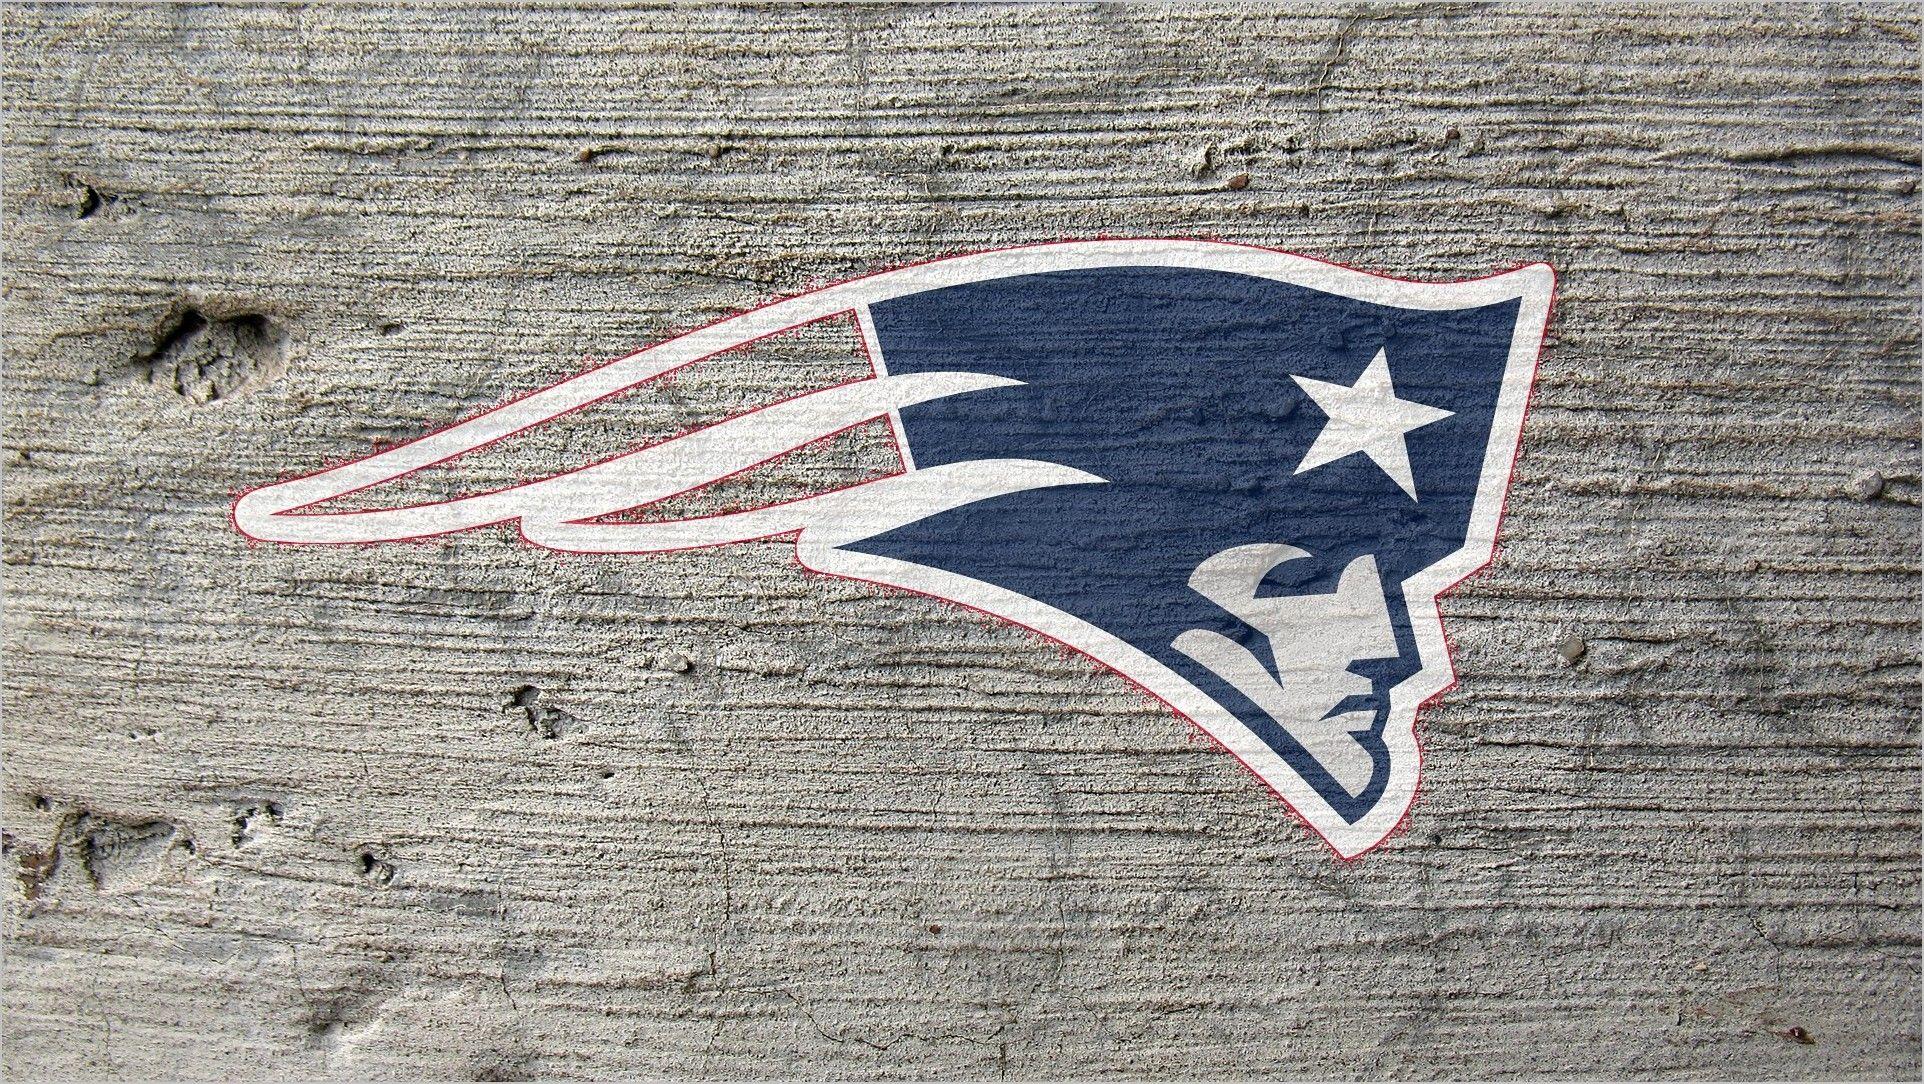 Patriots 4k Dual Monitor Wallpaper In 2020 New England Patriots Wallpaper New England Patriots Patriots